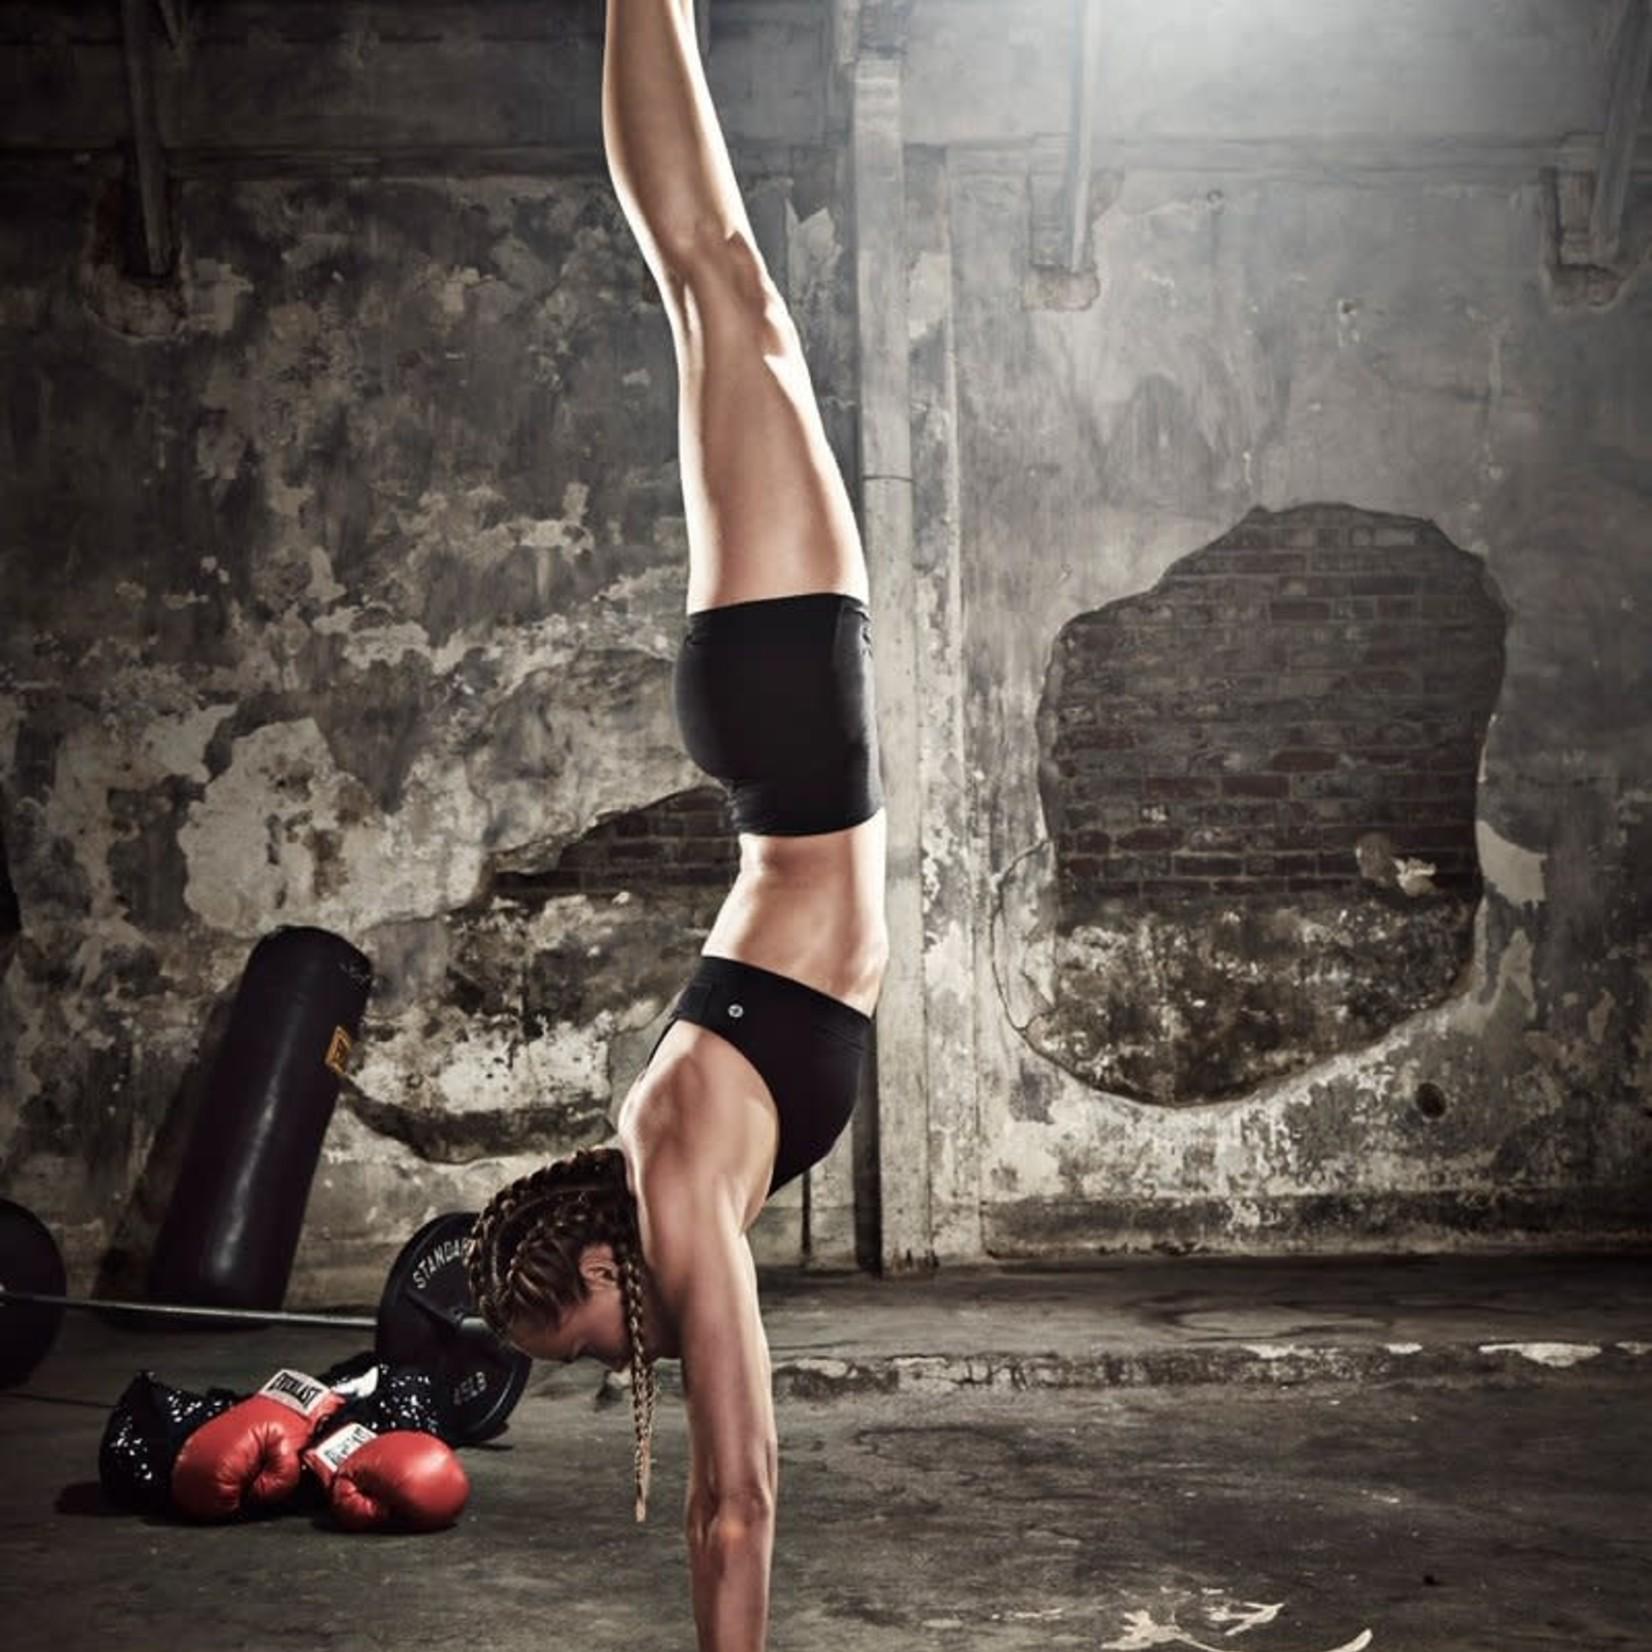 Manduka Manduka X training yoga mat-71 inch-Black 5mm